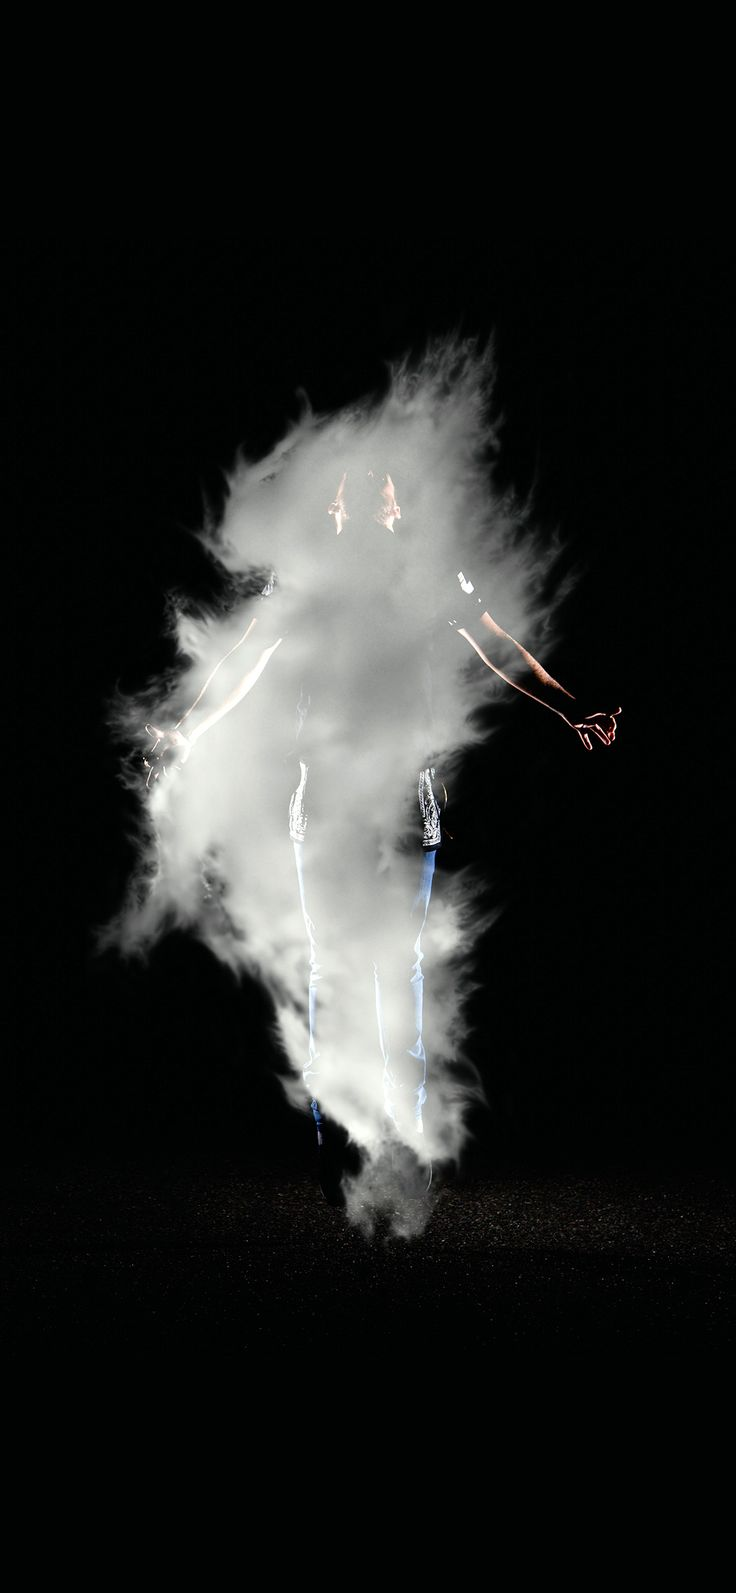 Iphone X Wallpaper Az49 Man Dark Smoke Illustration Art Black Via